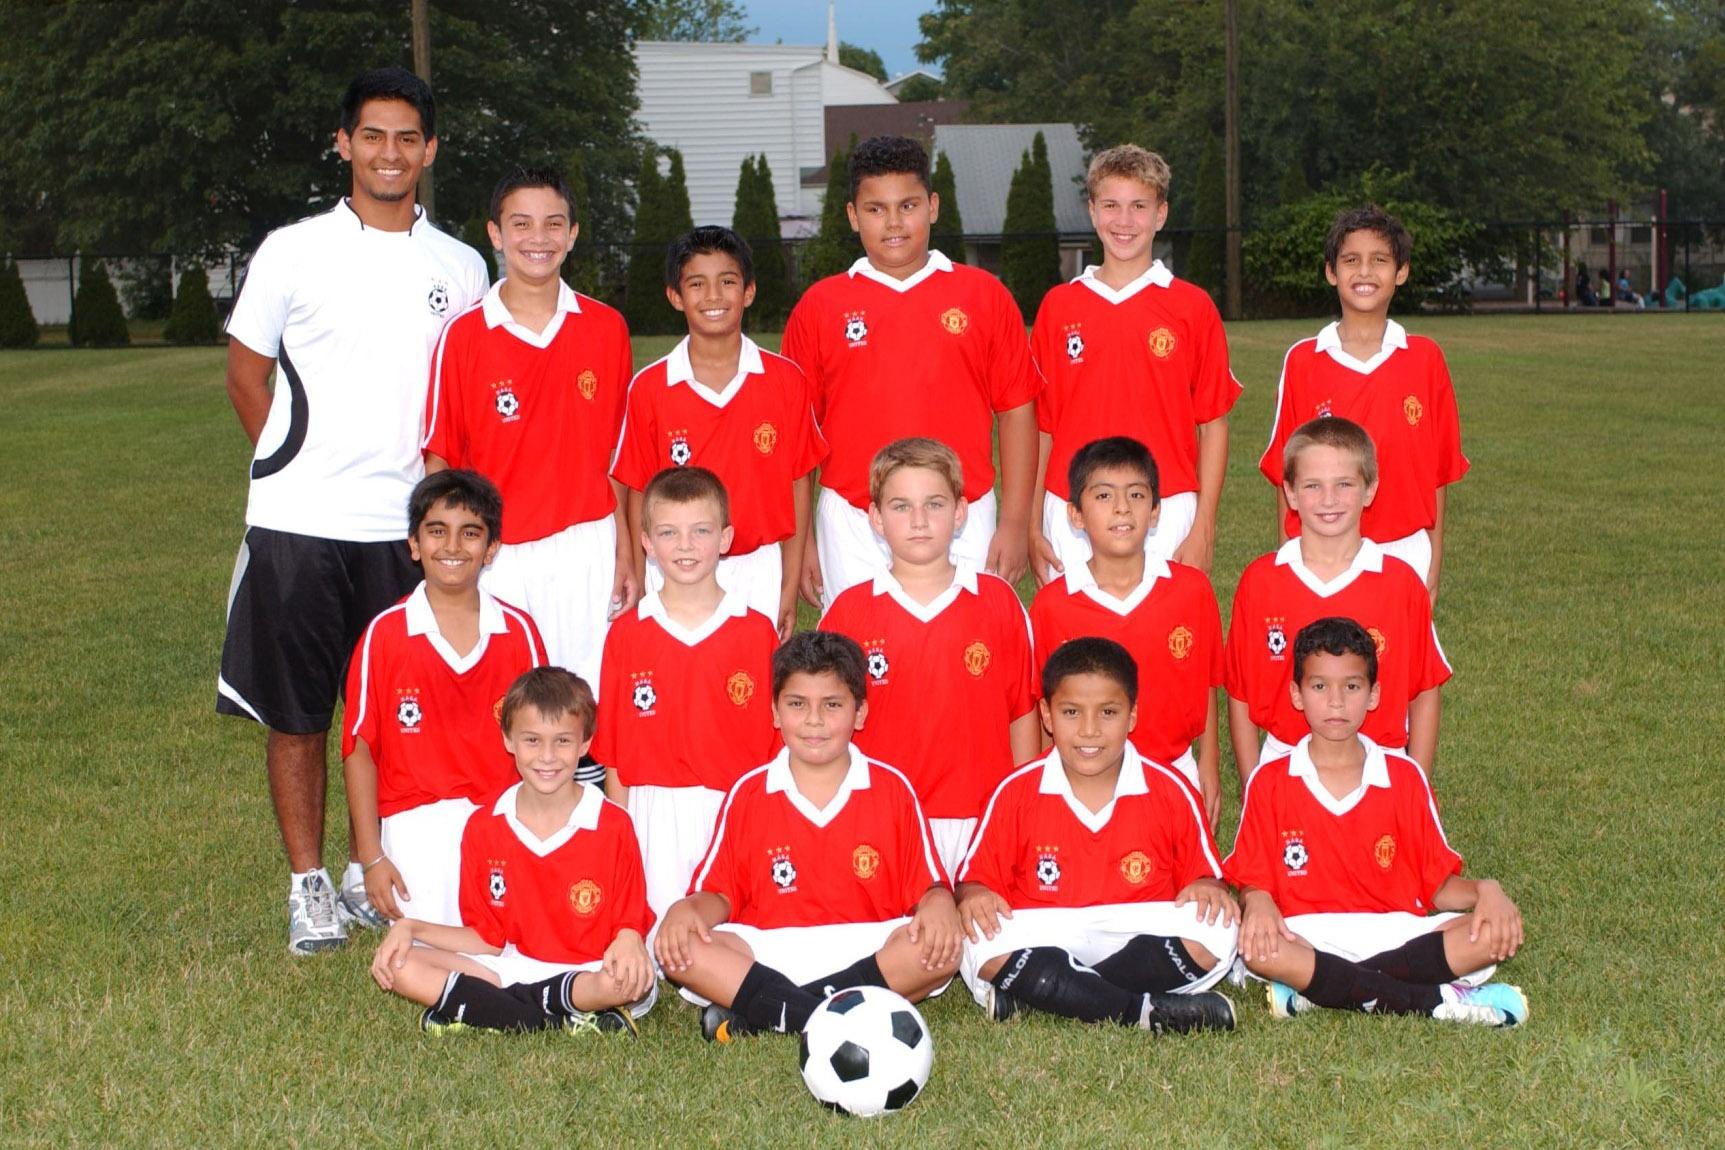 nasa soccer girls - photo #29